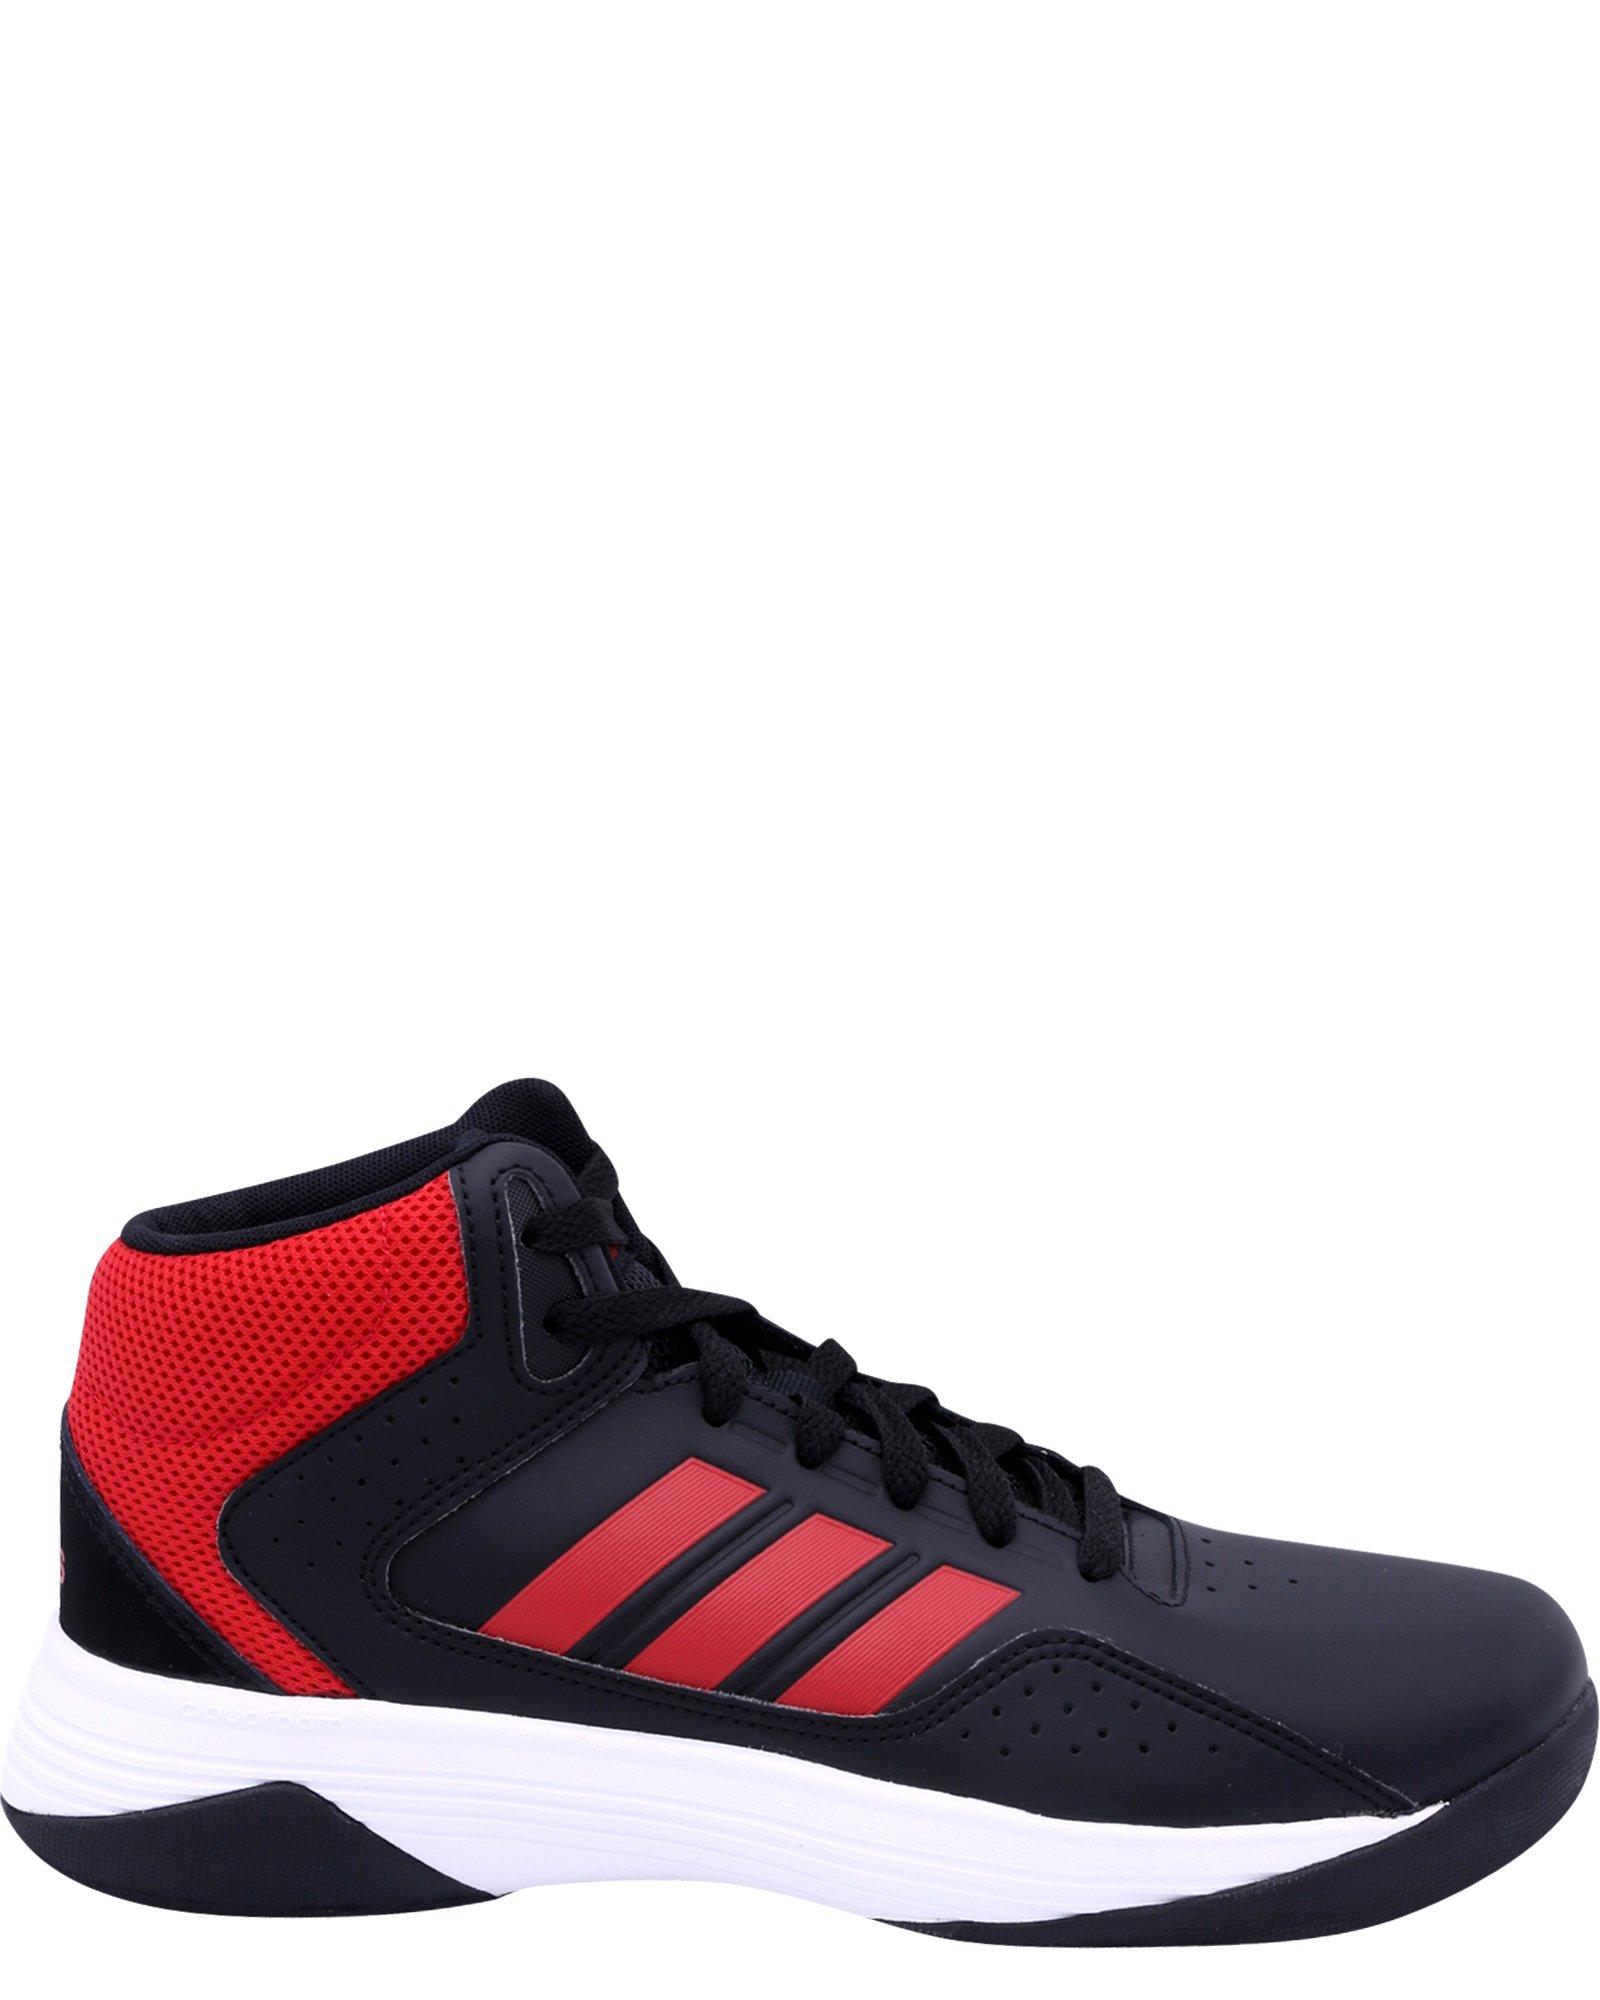 adidas NEO Boys' CF Ilation Mid K Basketball-Shoes, Black/Scarlet/White, 4 Medium US Little Kid